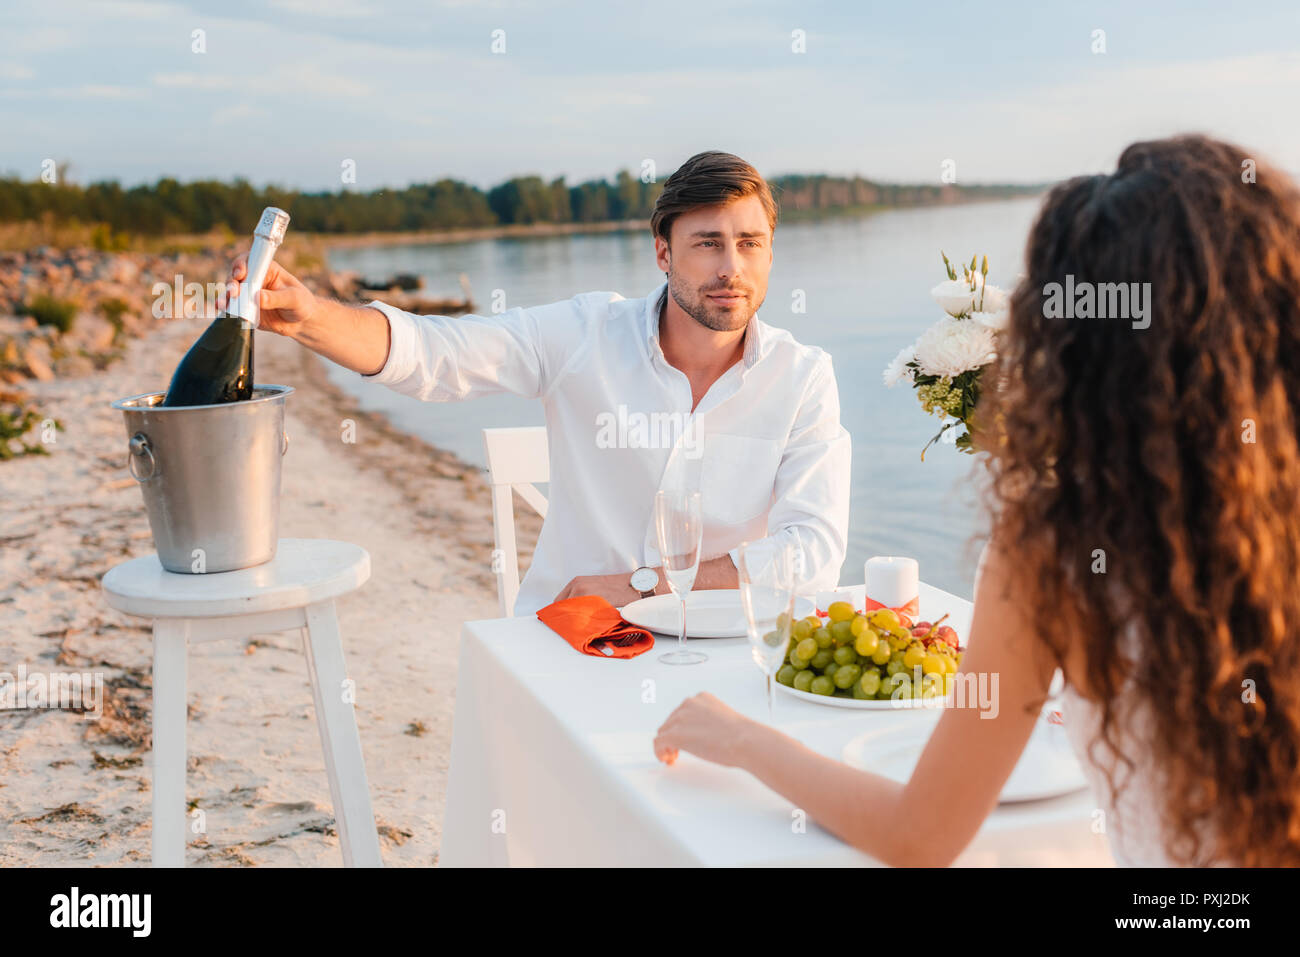 ingen svarar online dating